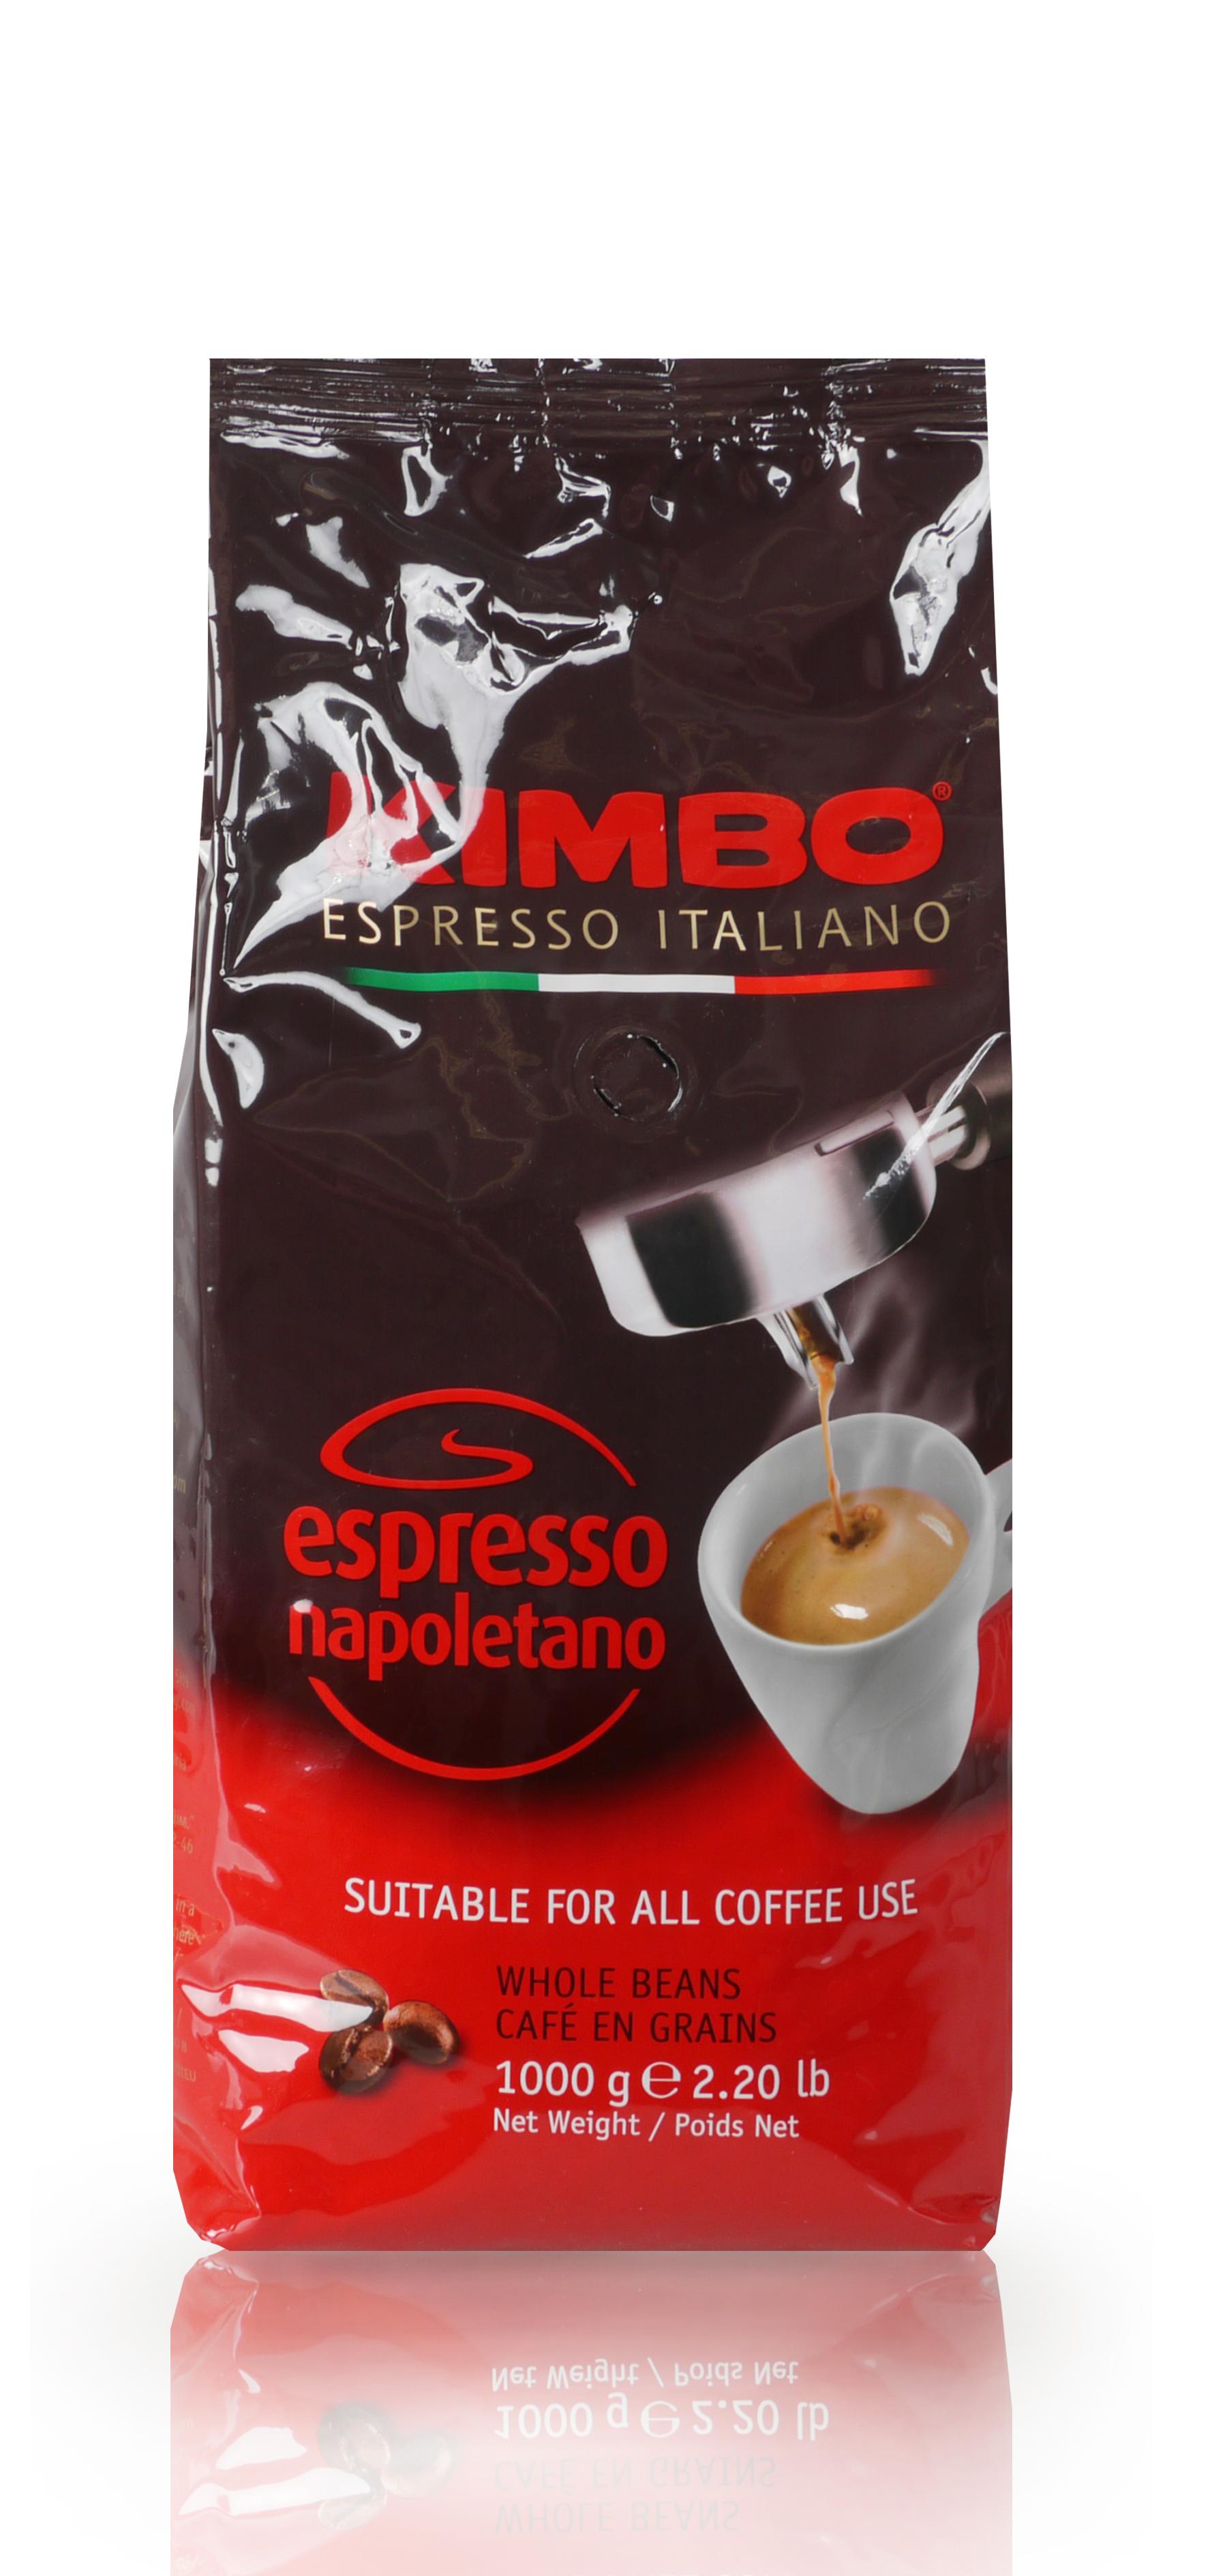 kimbo napoletano 1kg espresso kaffee jetzt g nstig kaufen. Black Bedroom Furniture Sets. Home Design Ideas